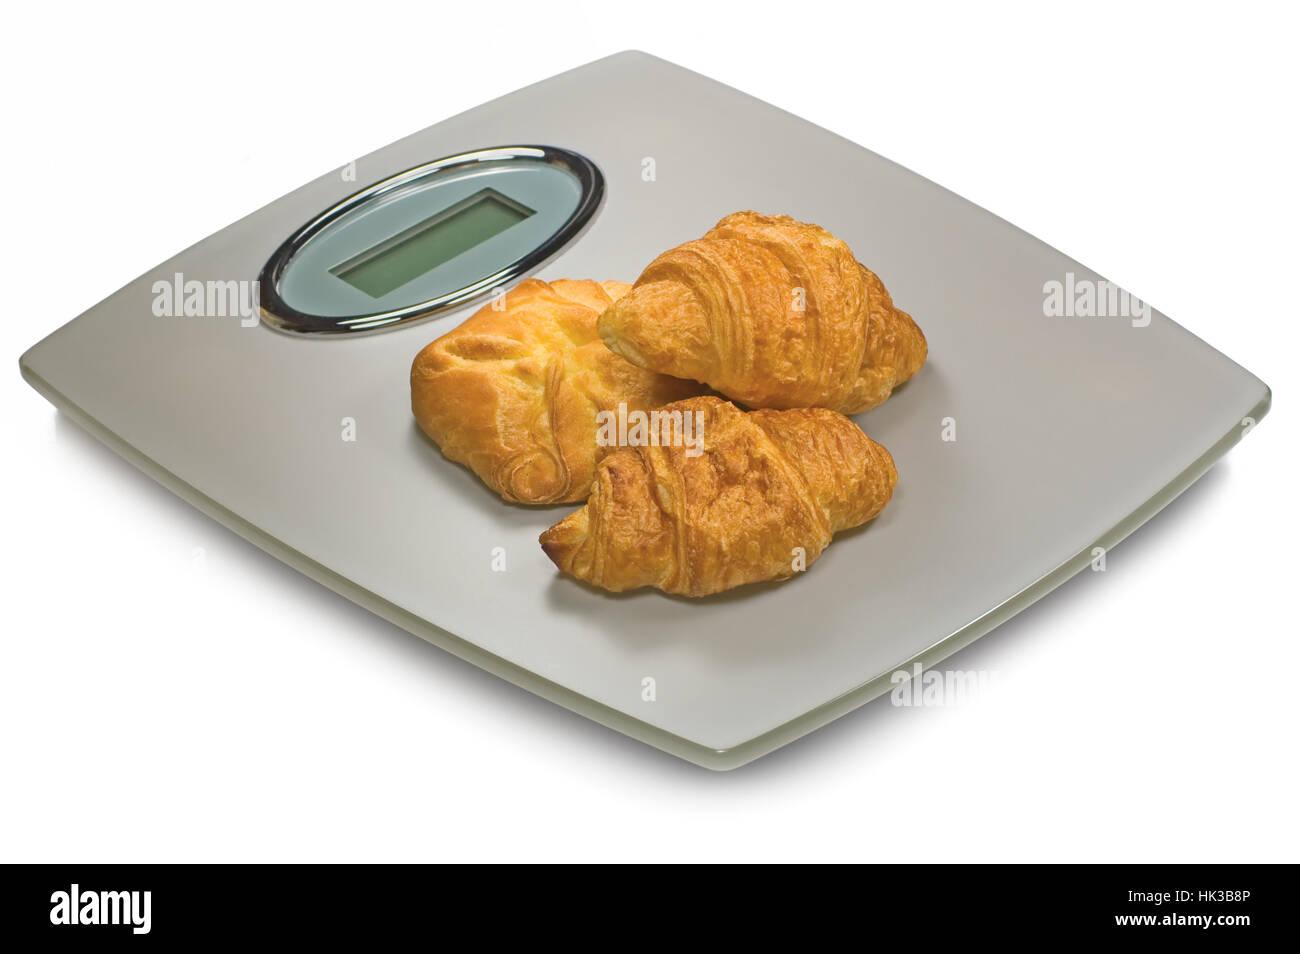 Digital Bathroom Scale And Croissants, Isolated Studio Shot Closeup - Stock Image